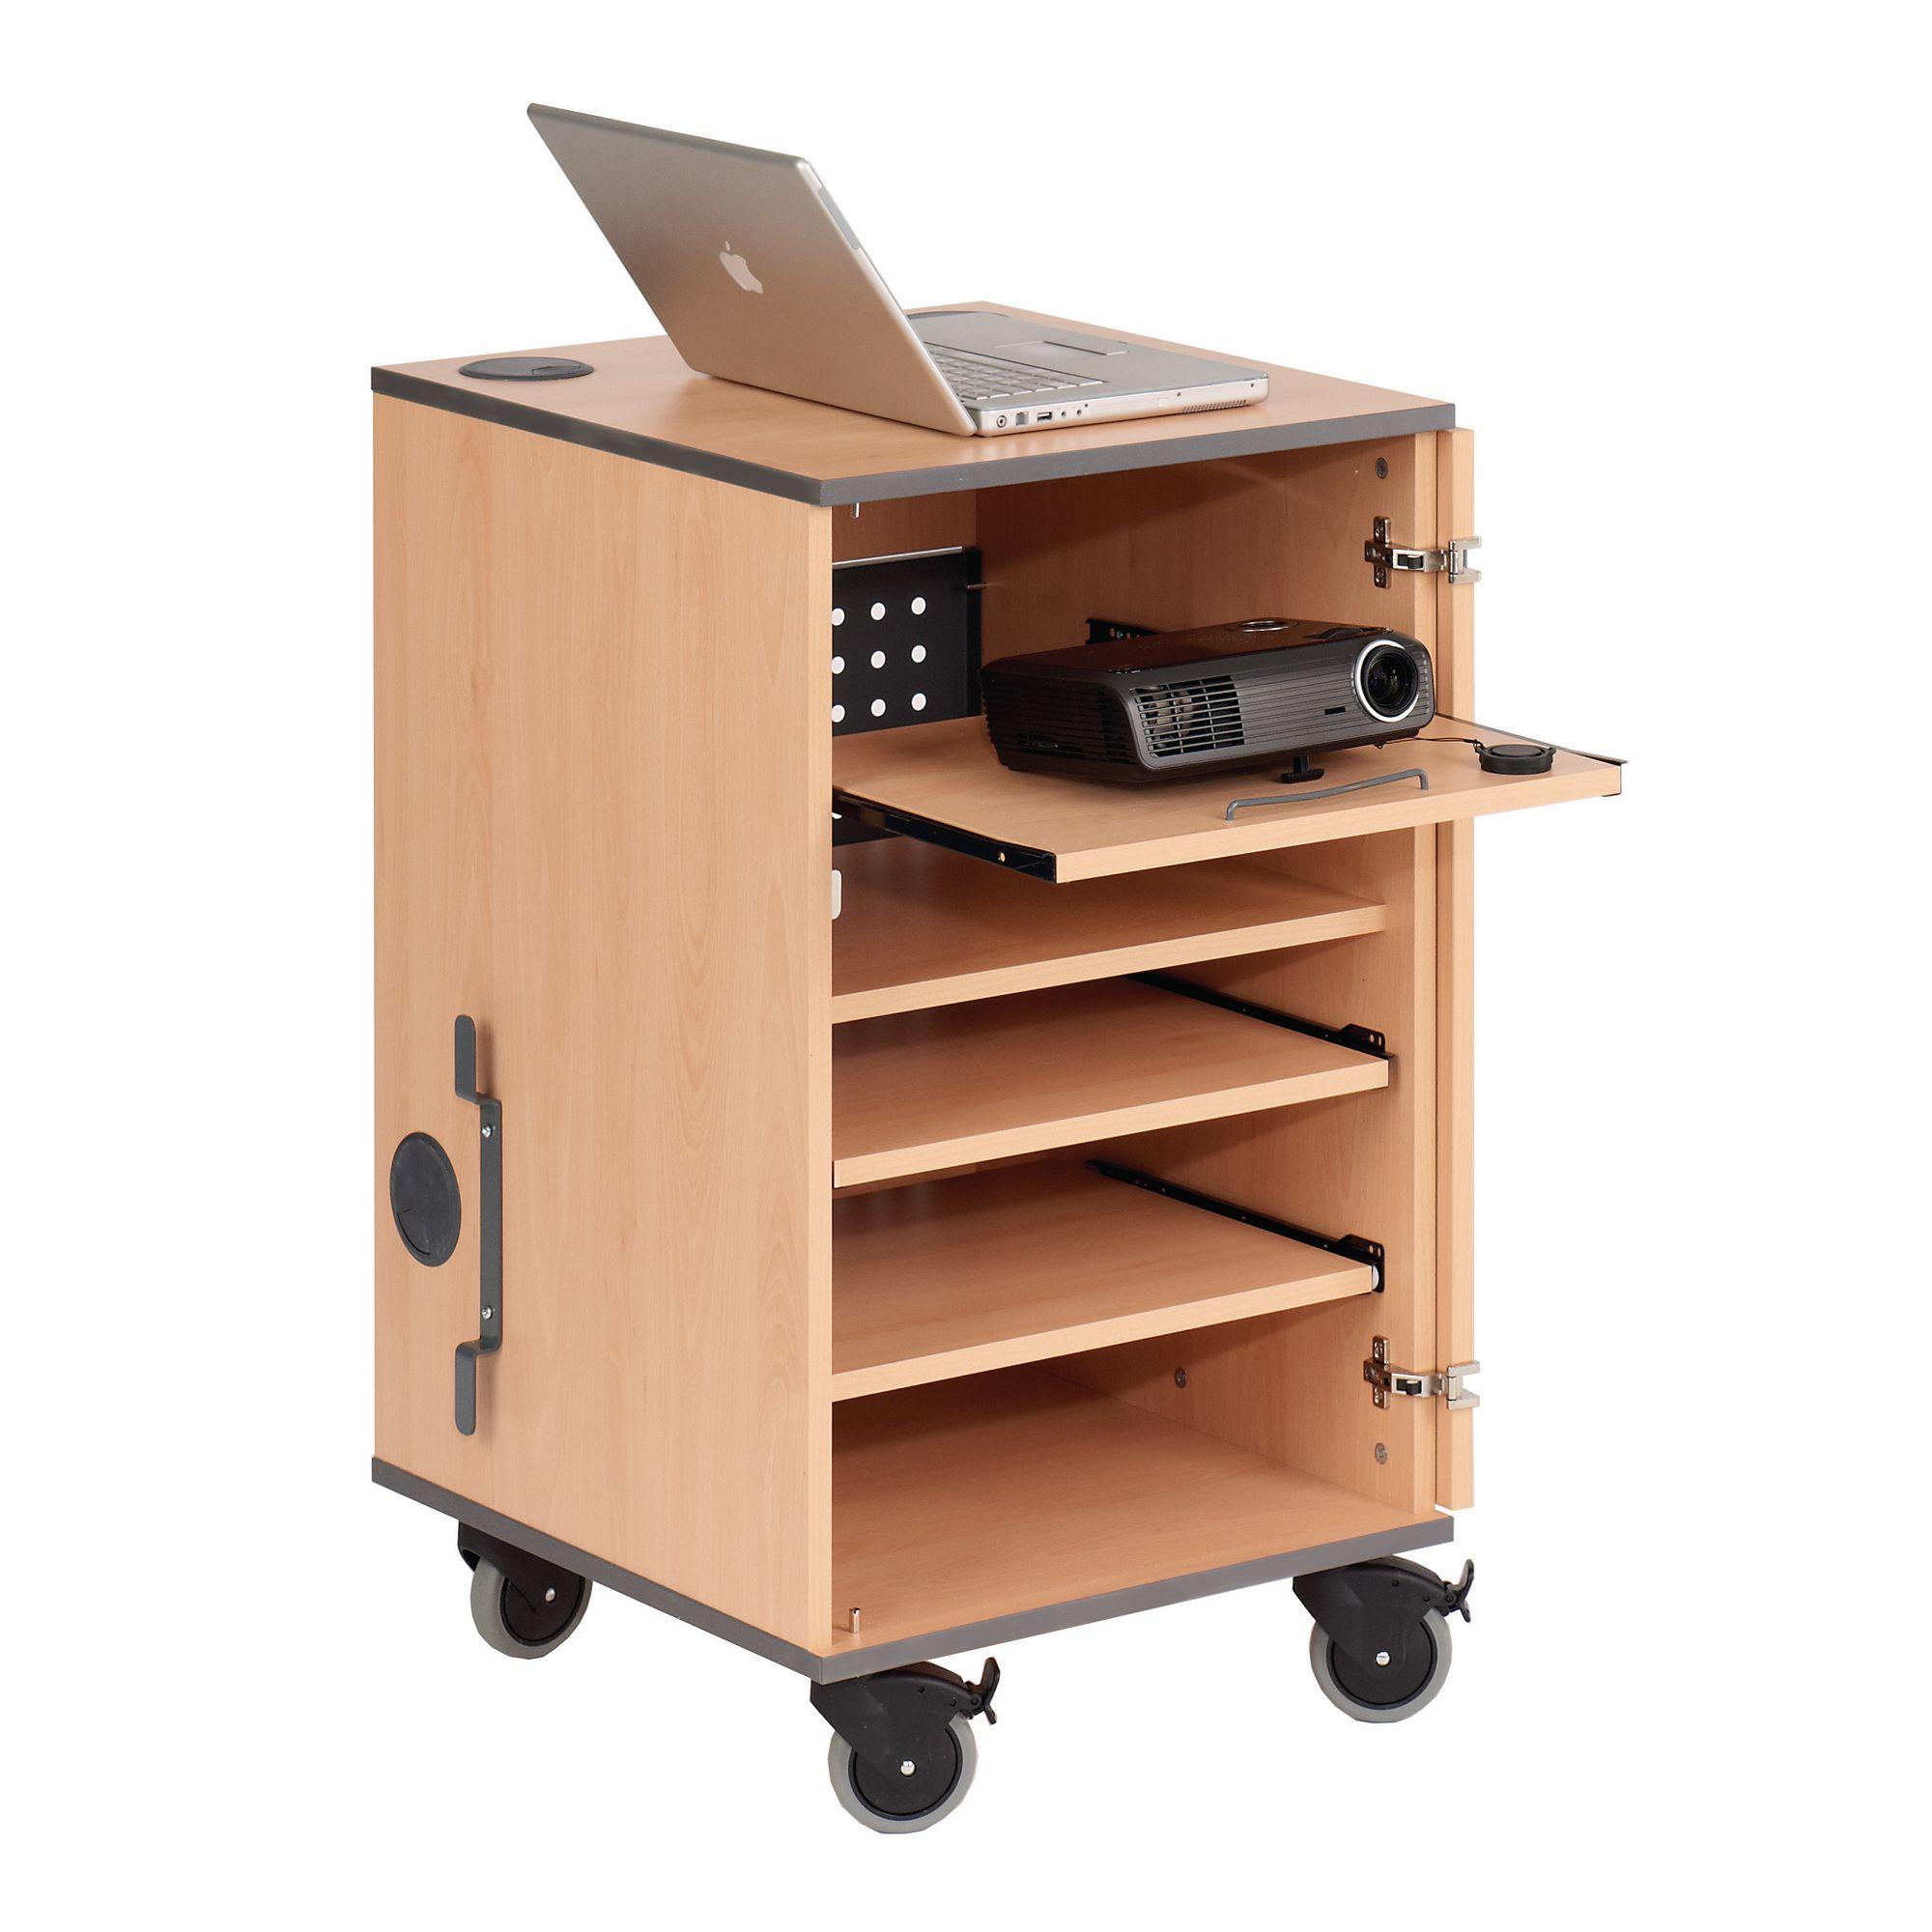 MM90 Multi Media Projector Cabinet